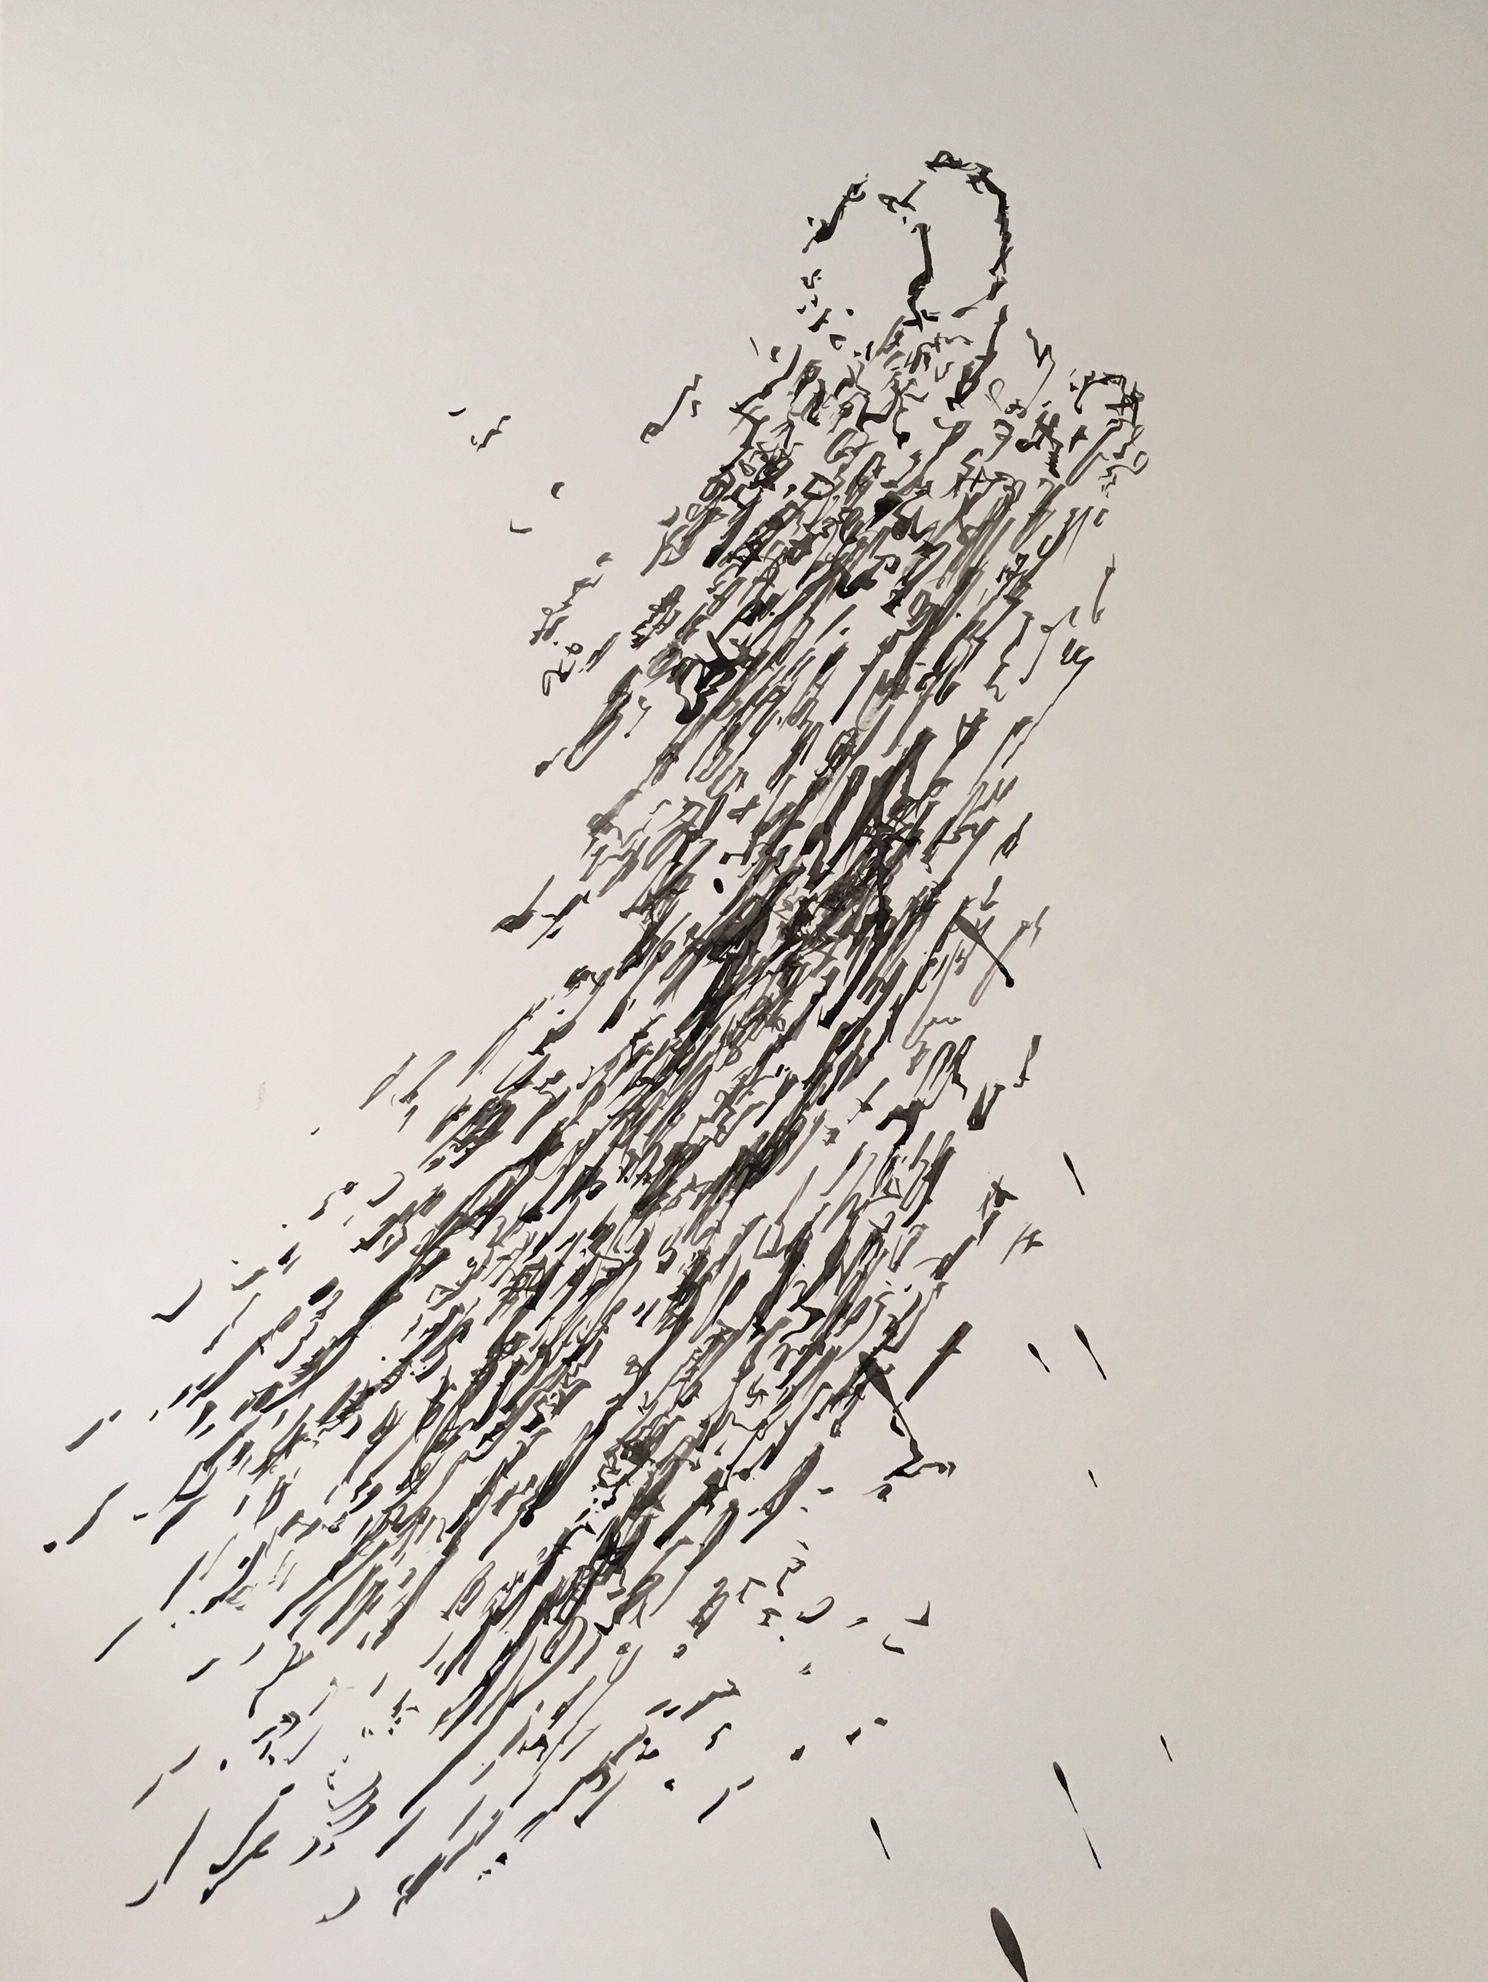 Untitled 7 - Farzad Kohan